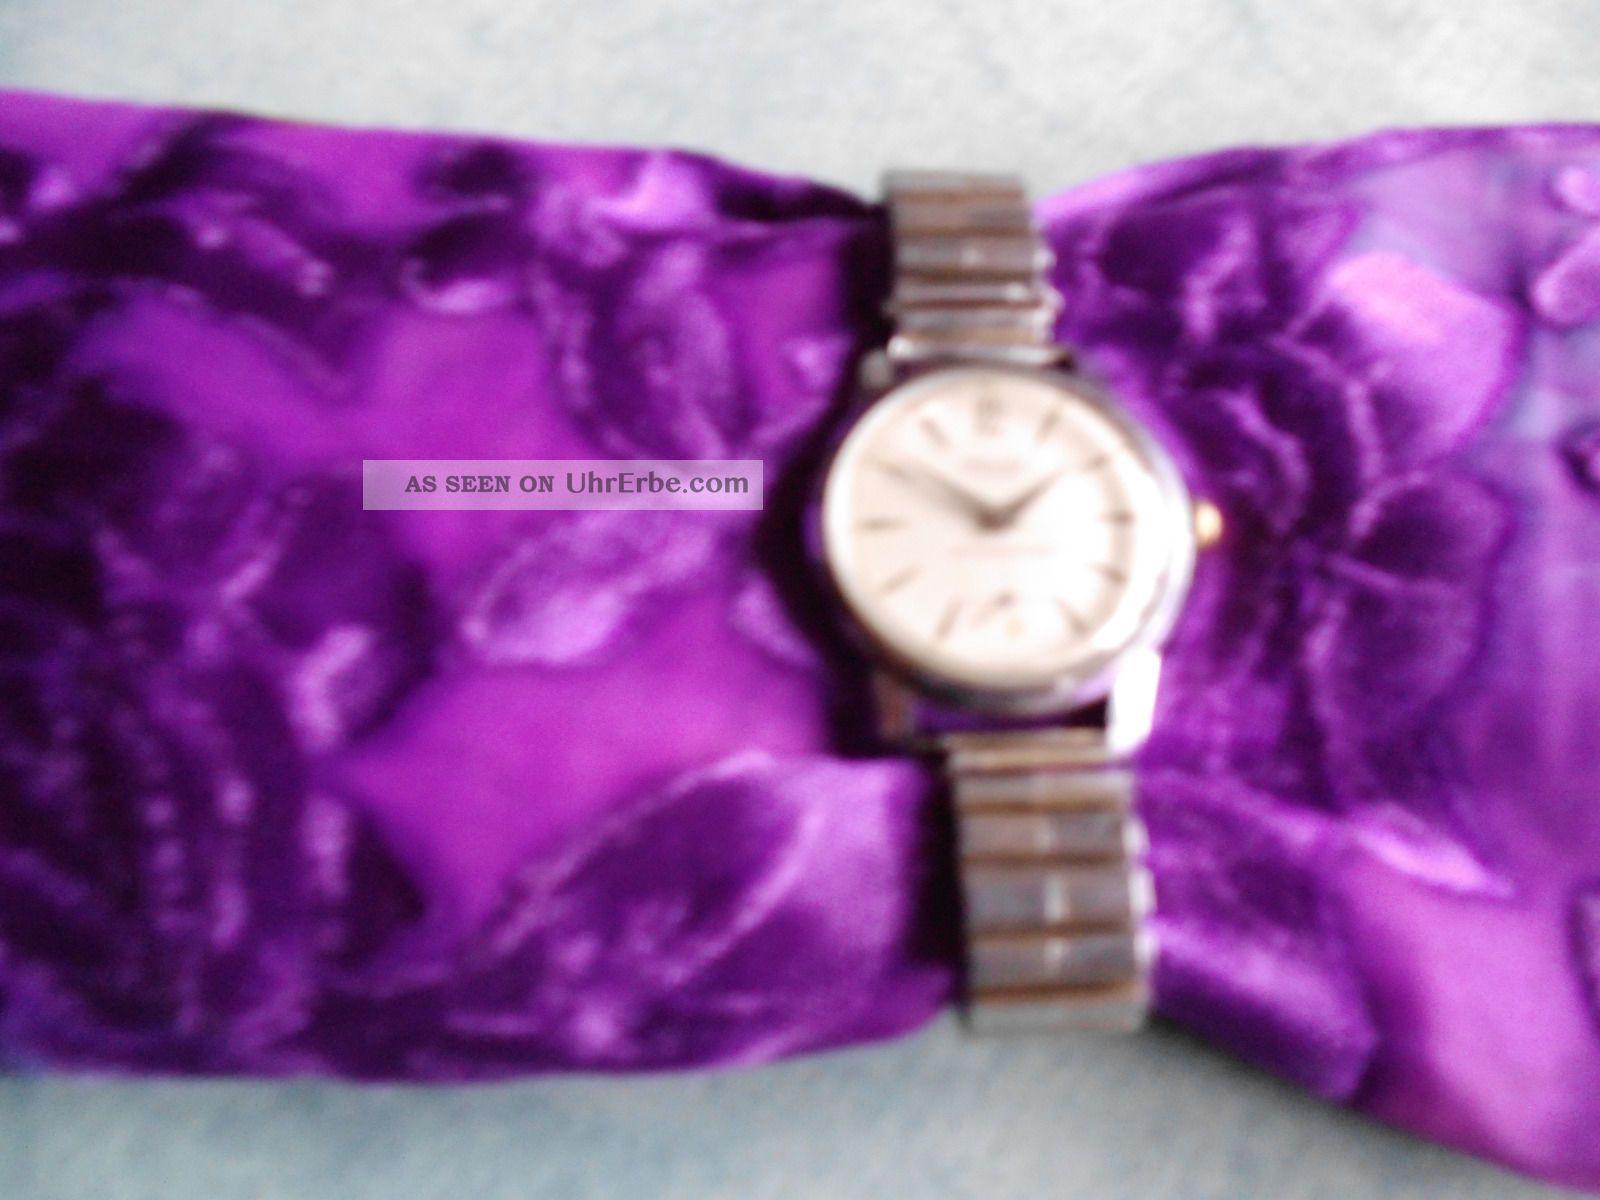 Nivada Uhr Wehrmachtswerk Incabloc Handaufzug Mit Zugarmband Armbanduhren Bild